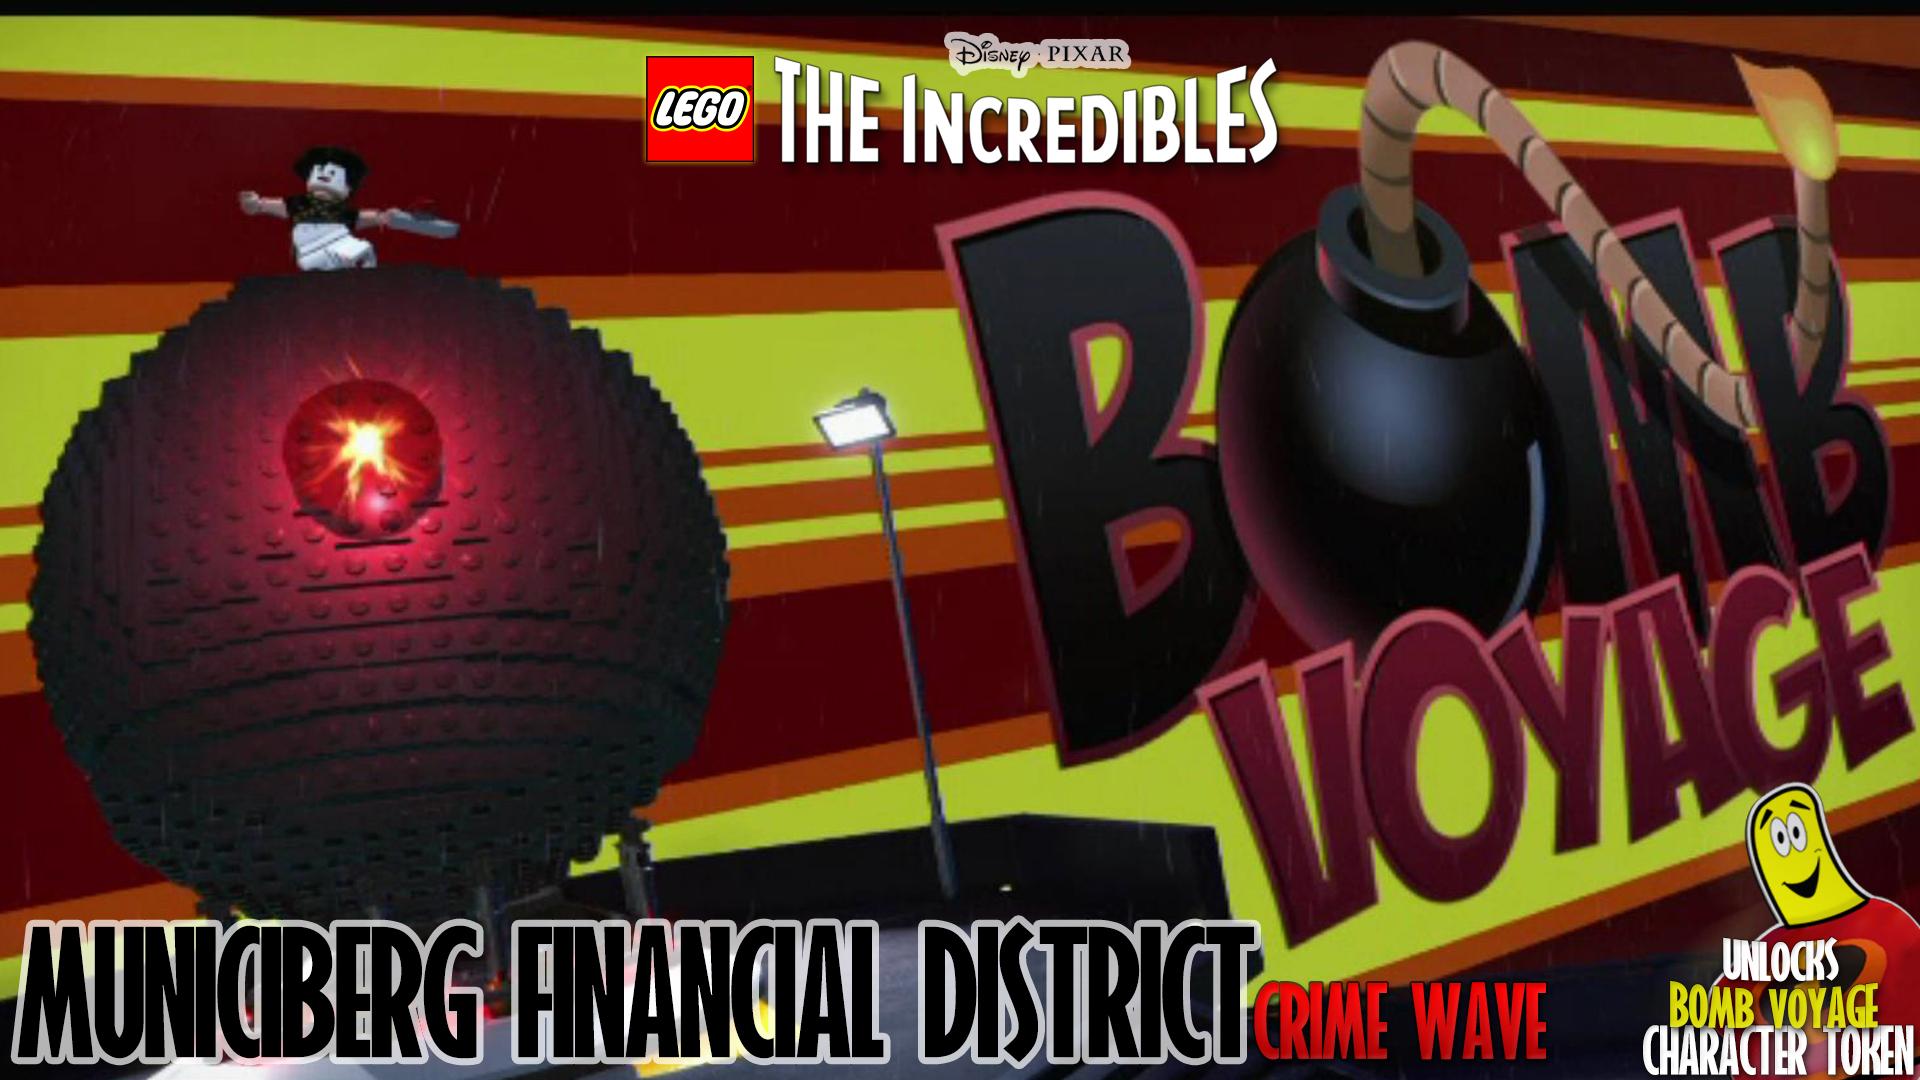 LegoIncredMunicibergFinancialDistrictCRIMEWAVEThumb